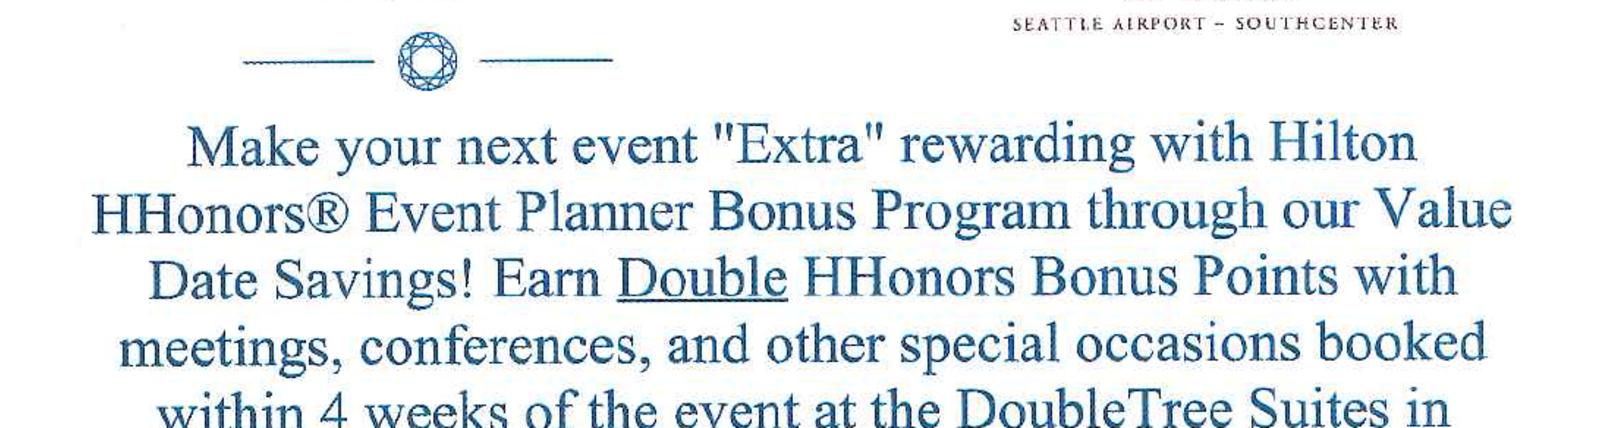 Double Hilton Honors Bonus Points